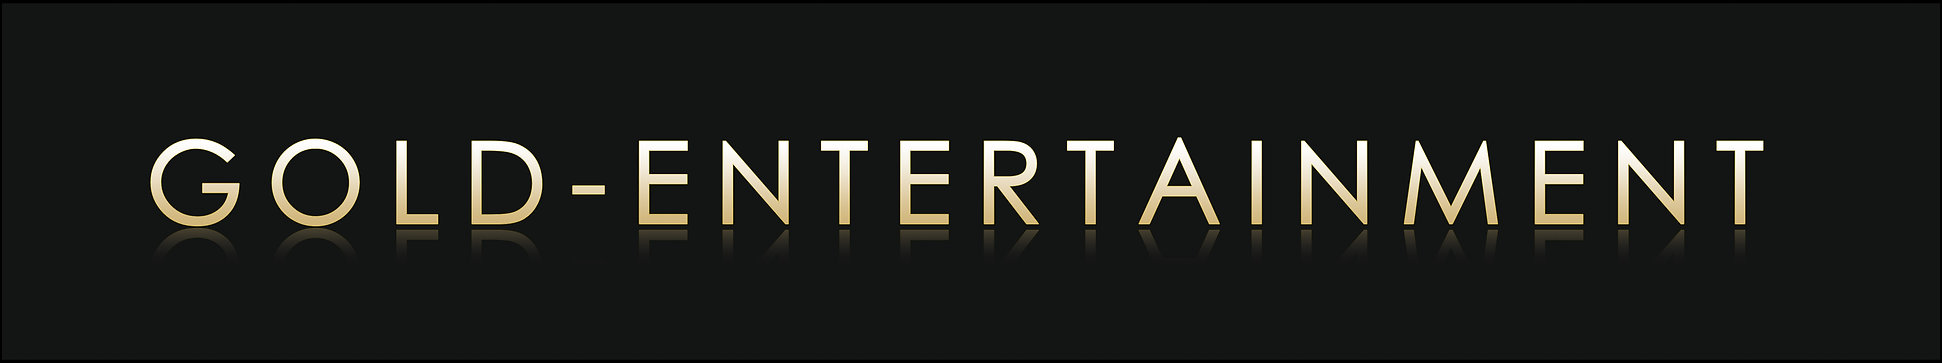 Gold Entertainment - Logo 5.jpg